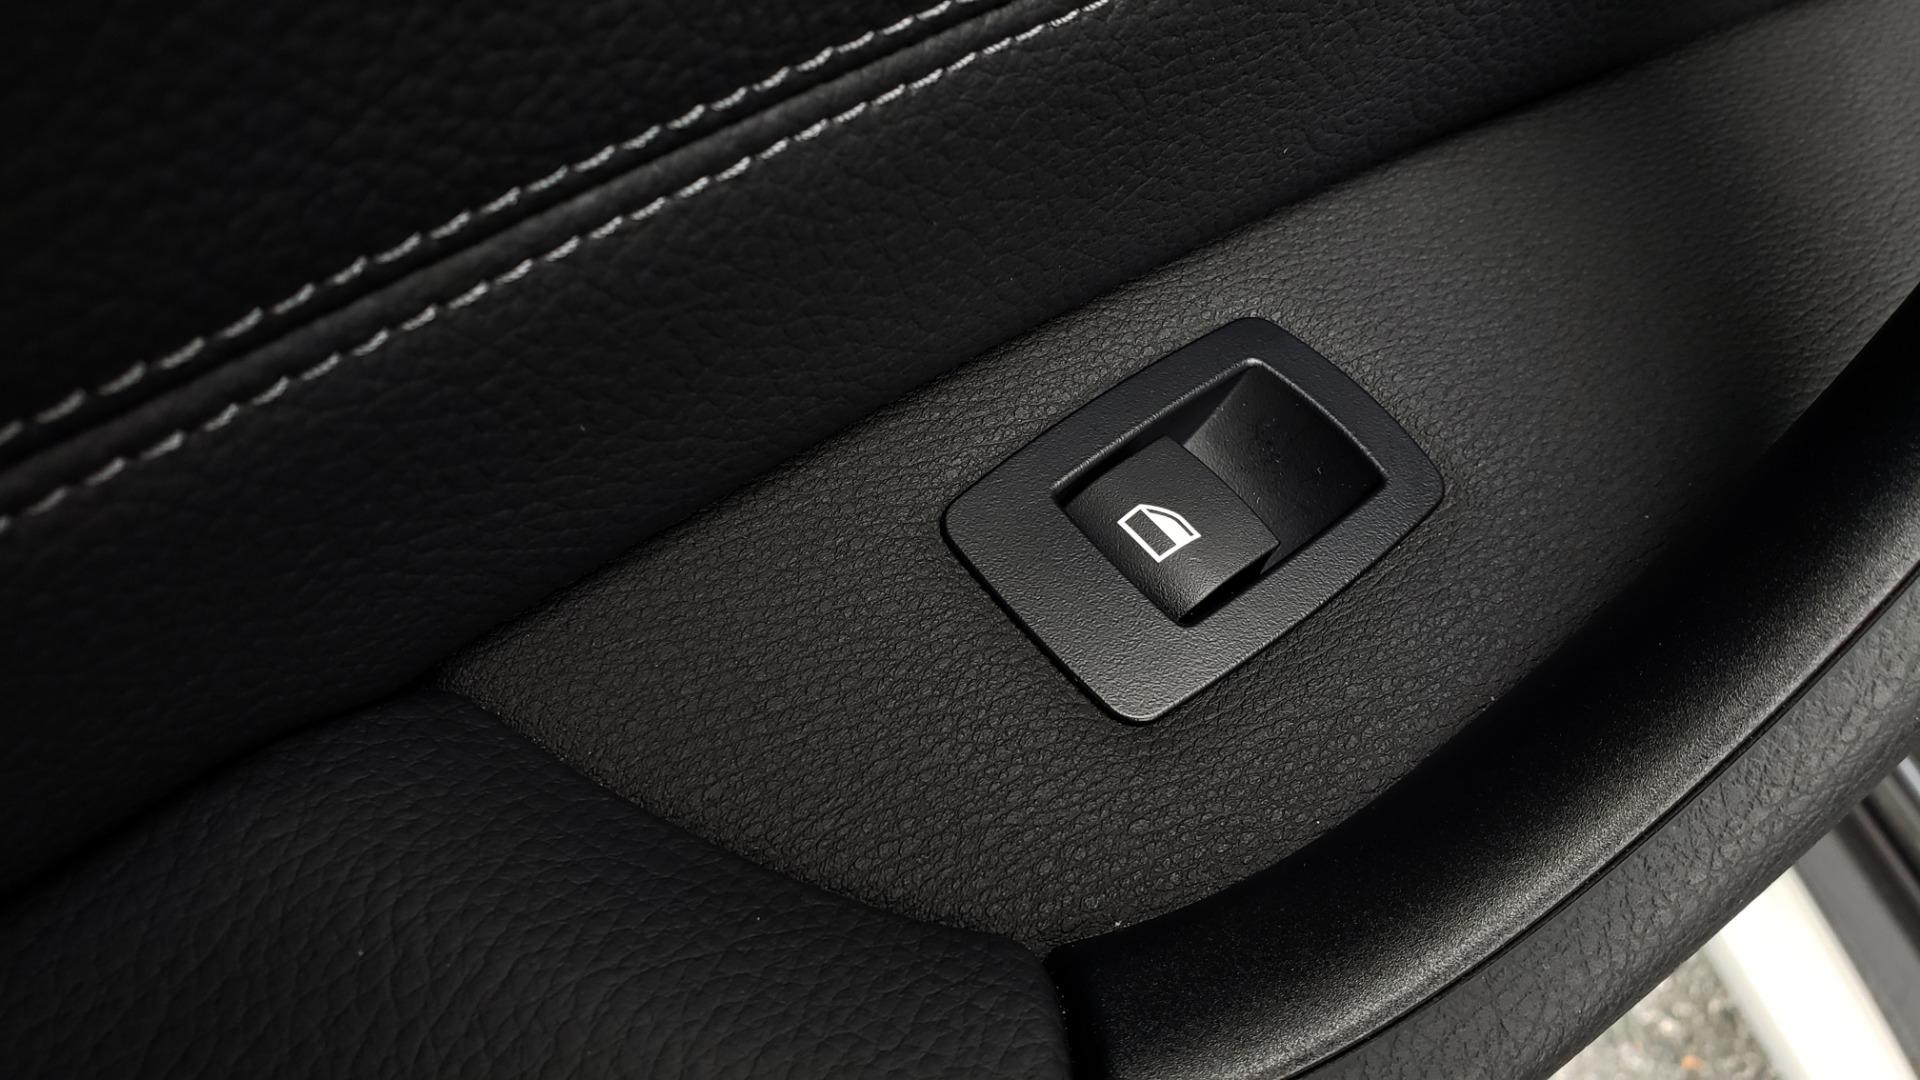 Used 2017 BMW X1 XDRIVE28I / PREM PKG / DRIVER ASST / NAV / CLD WTHR for sale Sold at Formula Imports in Charlotte NC 28227 62